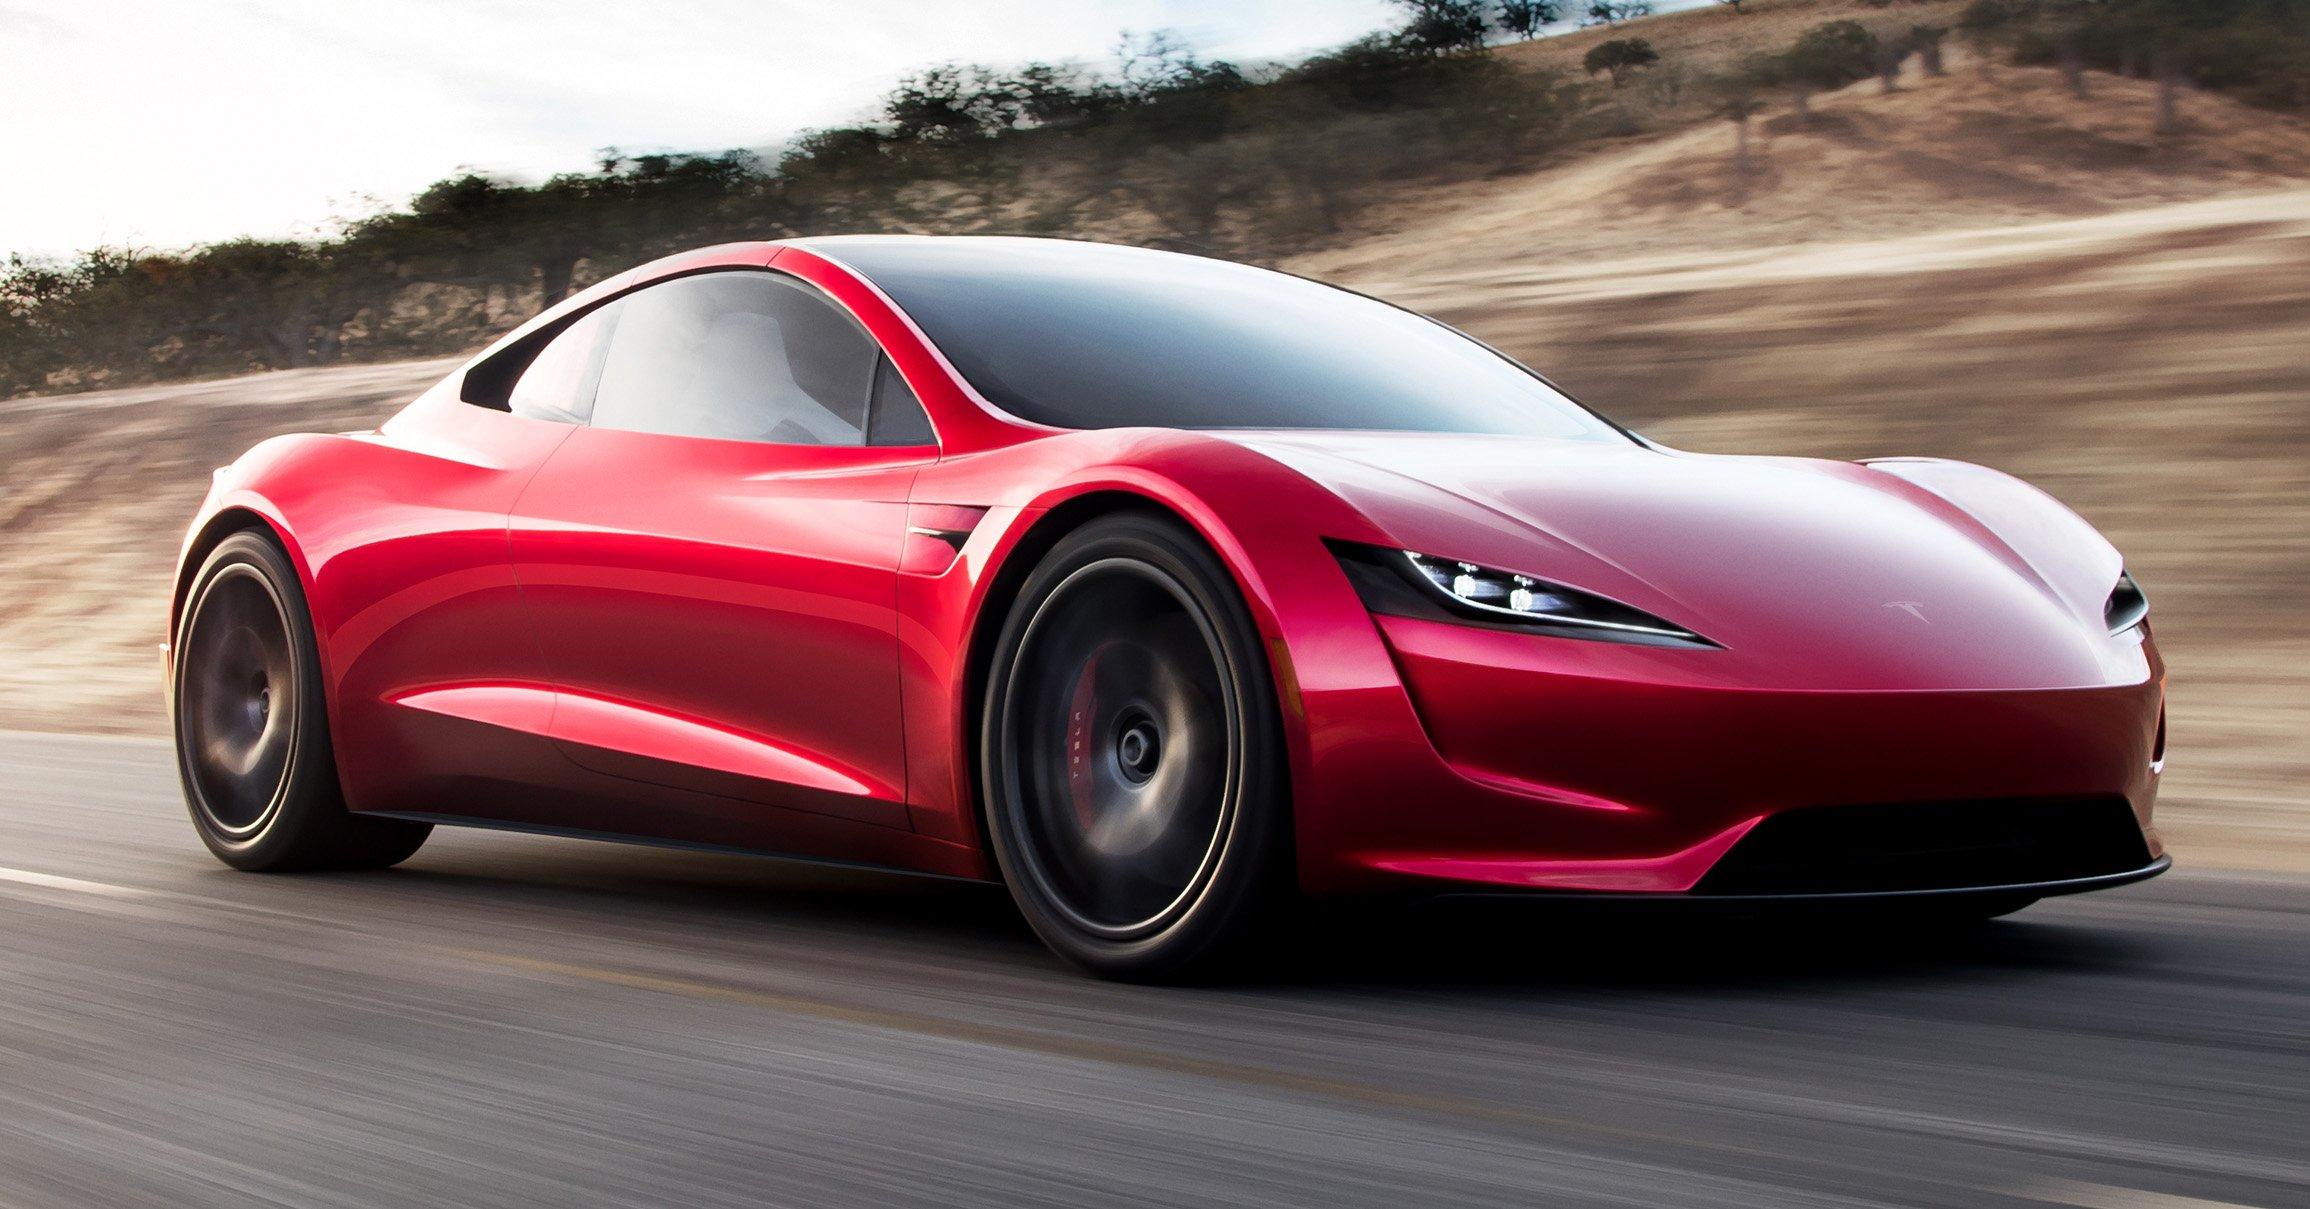 Elon Musk shocks with new Tesla Roadster - mashable.com